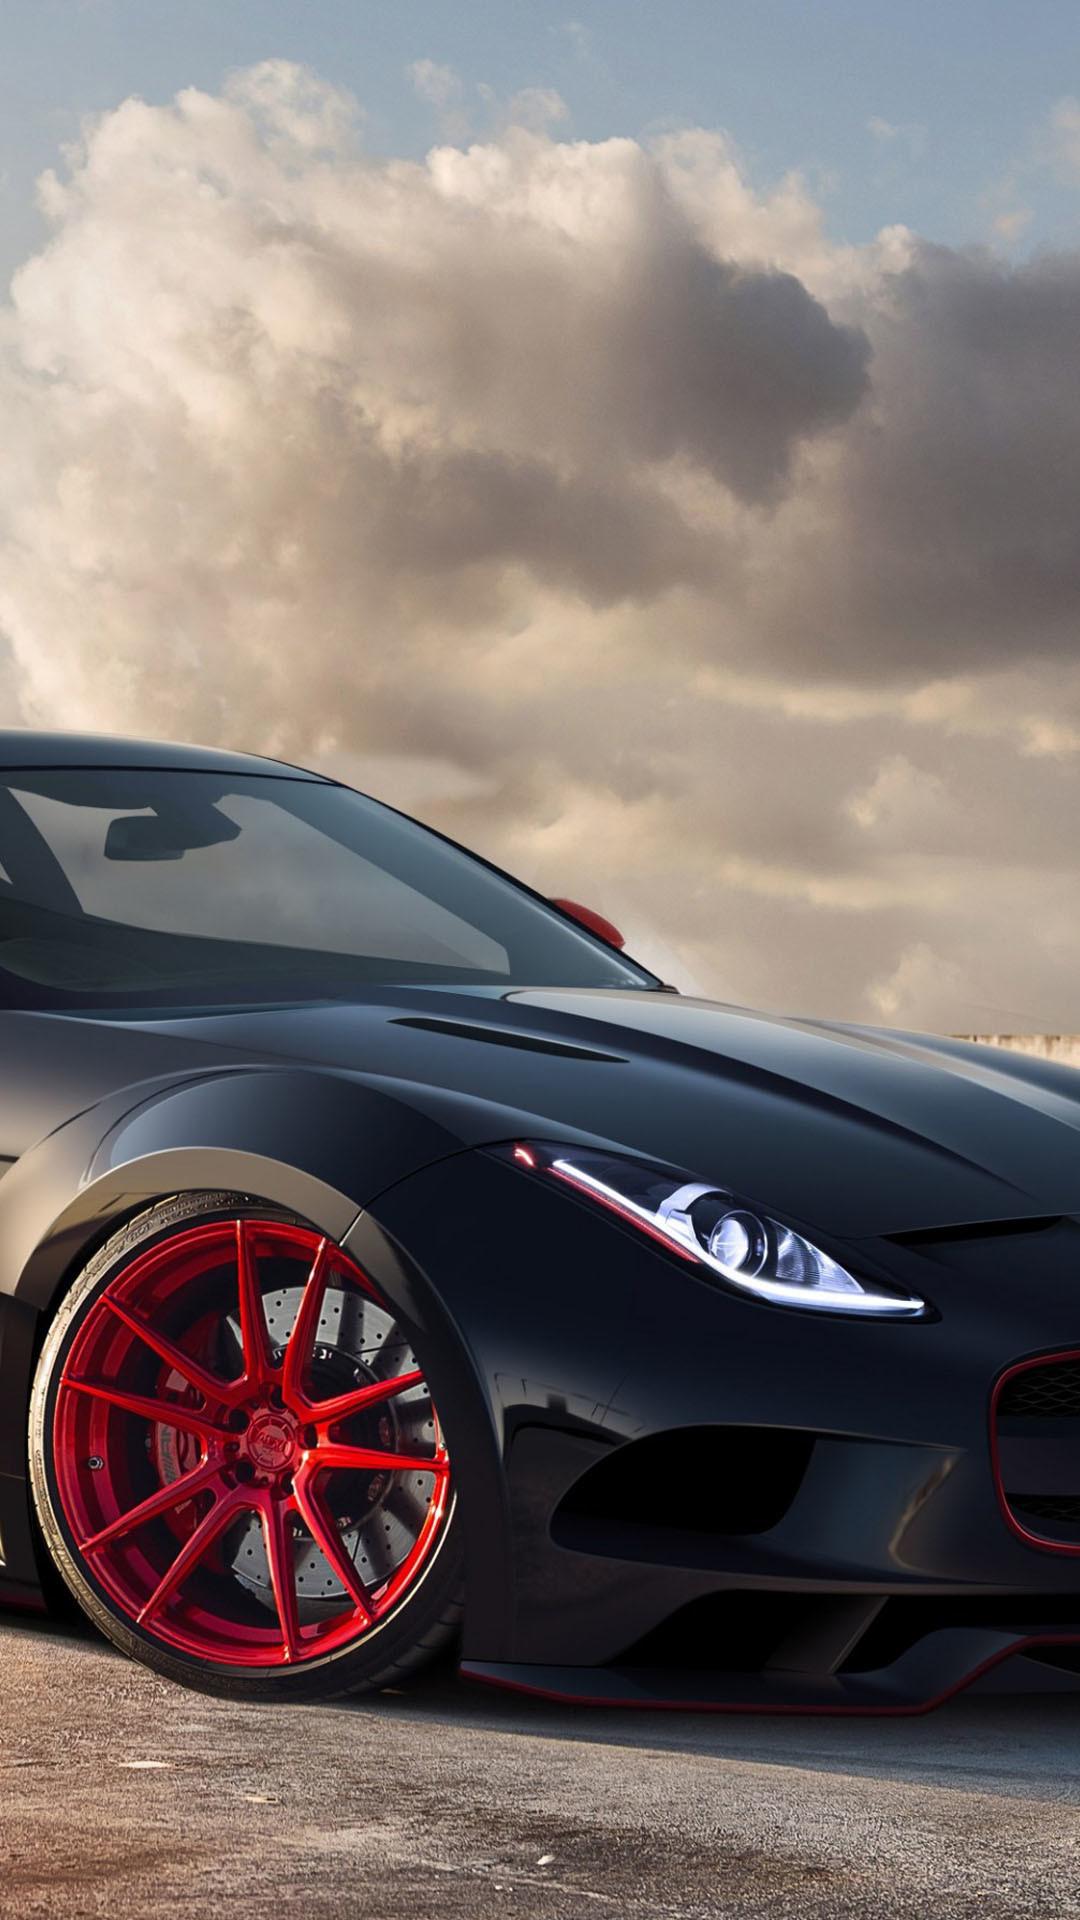 Men's World Jaguar C-X16 Black